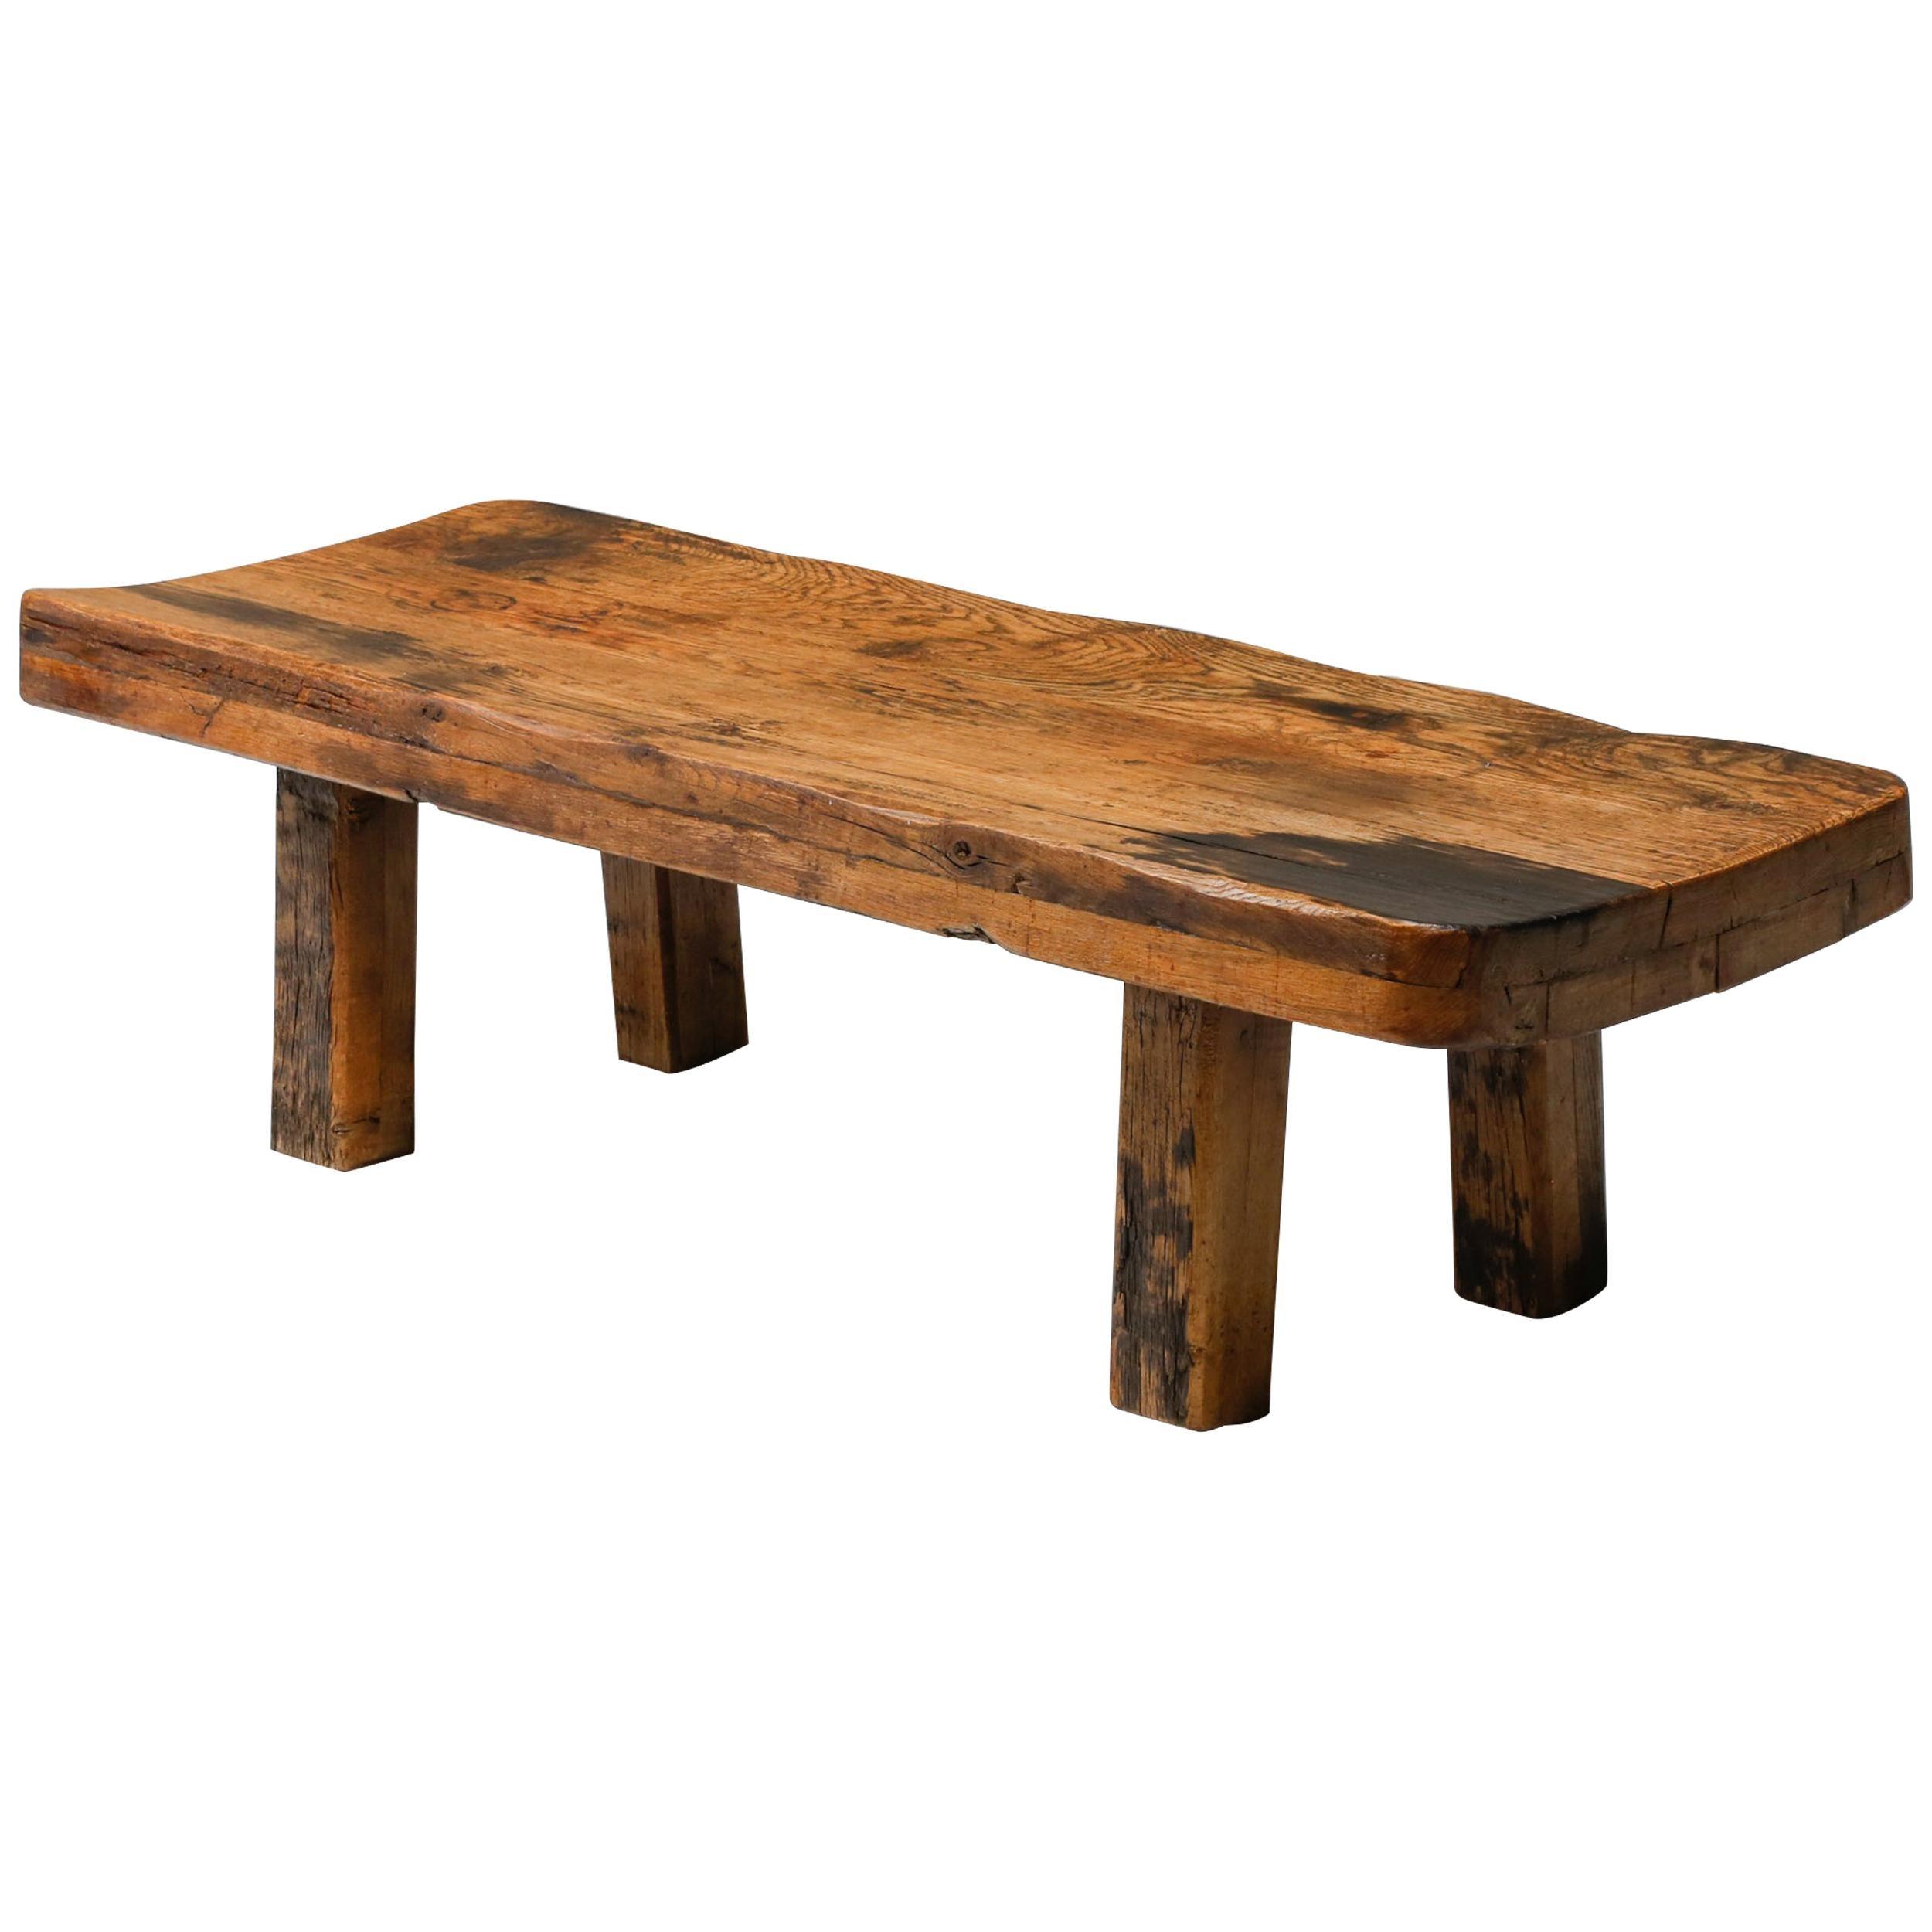 Rustic Modern Oak Bench Coffee Table Wabi Sabi Zen